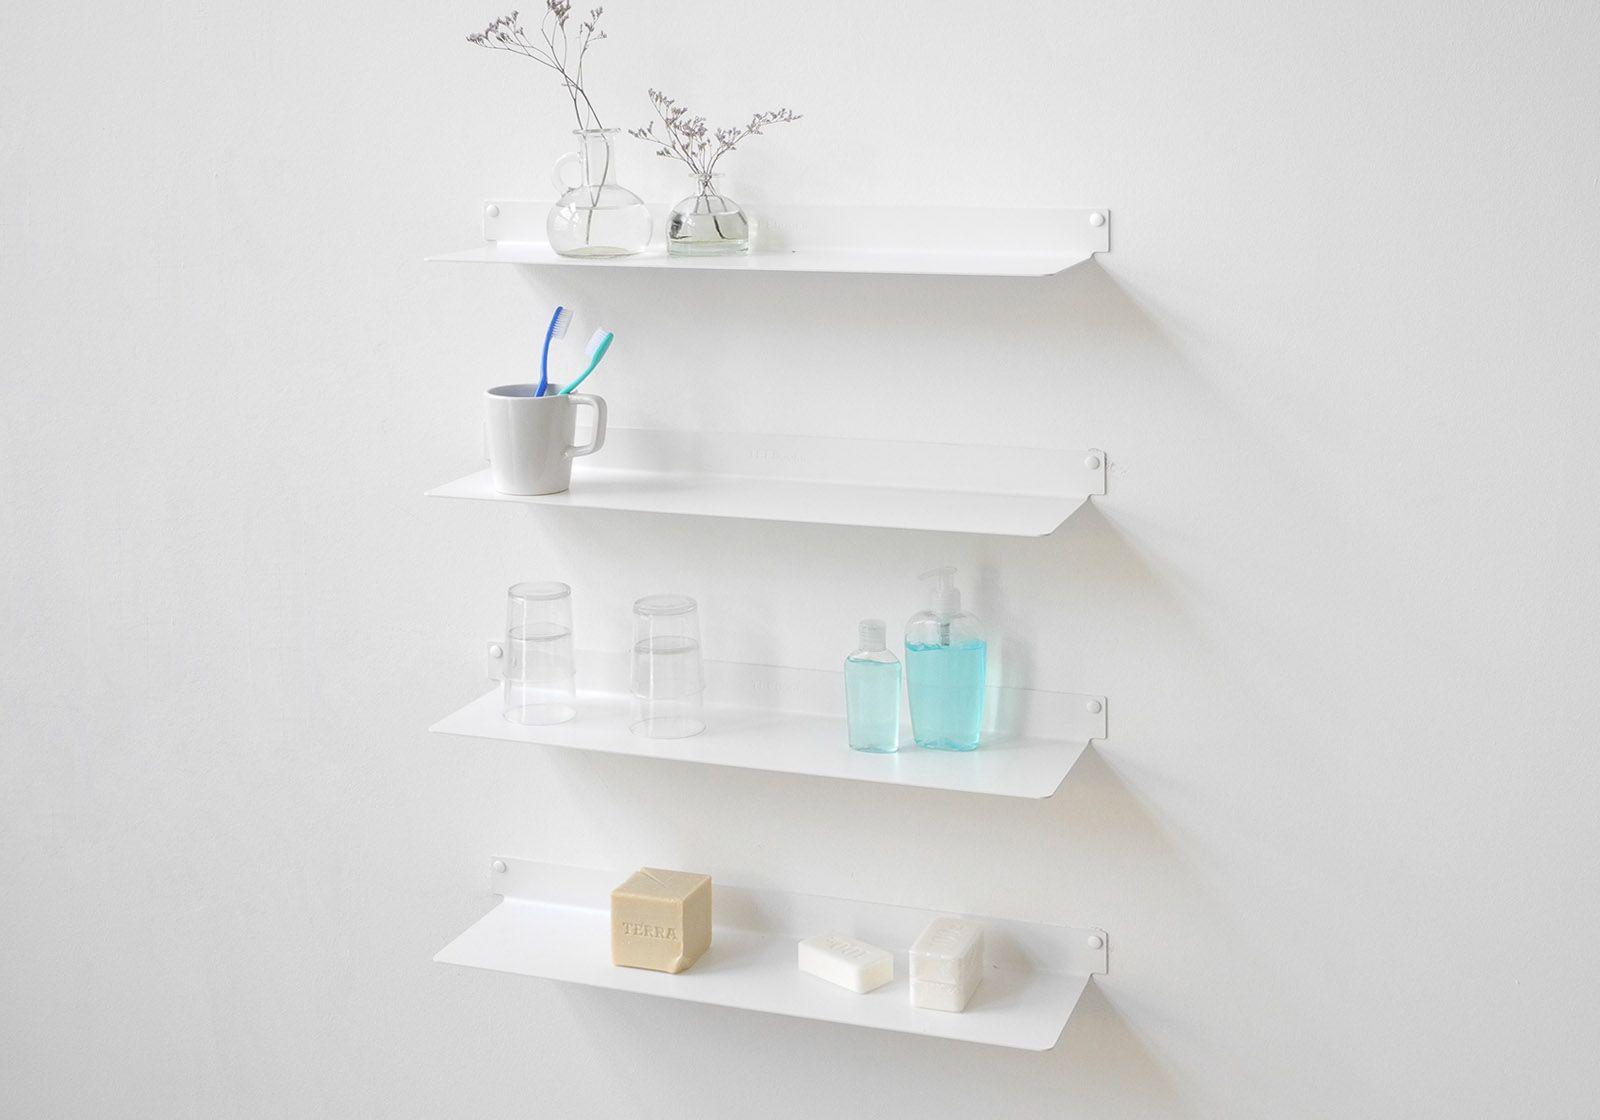 323 teeline 6015 bathroom shelves set of 4